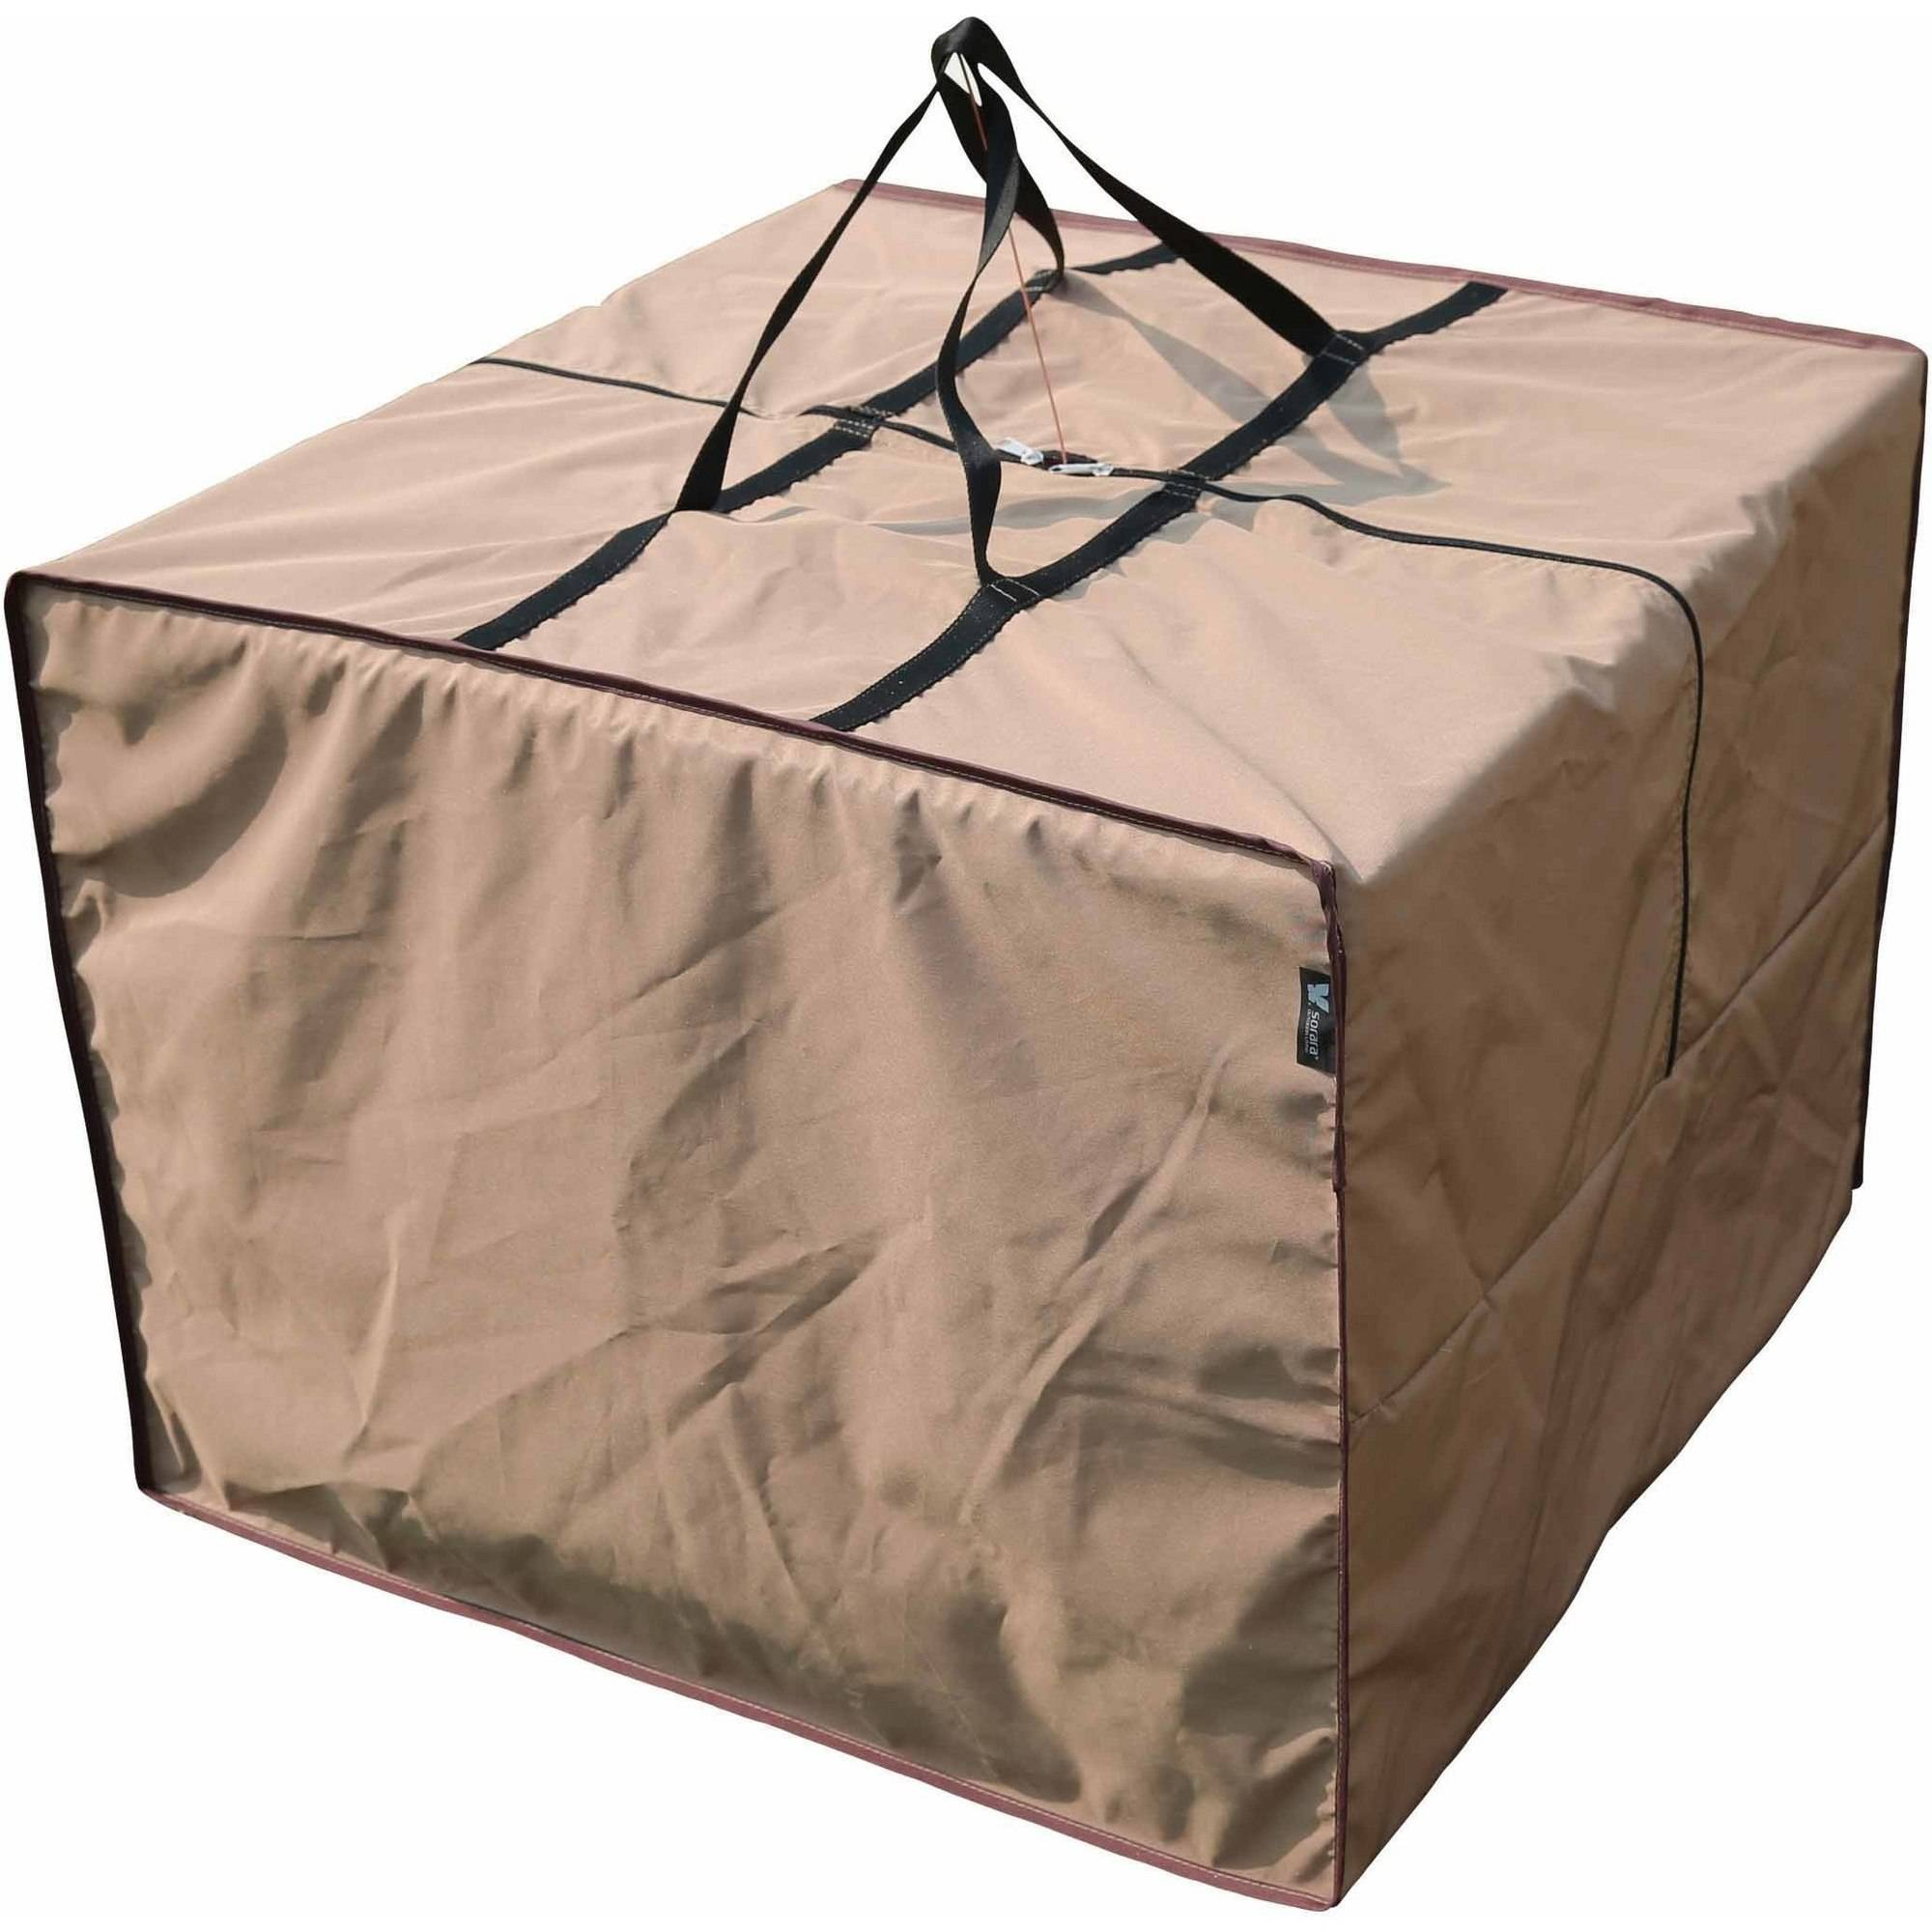 "TrueShade Plus Cushion Carry Bag, 31""L x 31""W x 23""H"